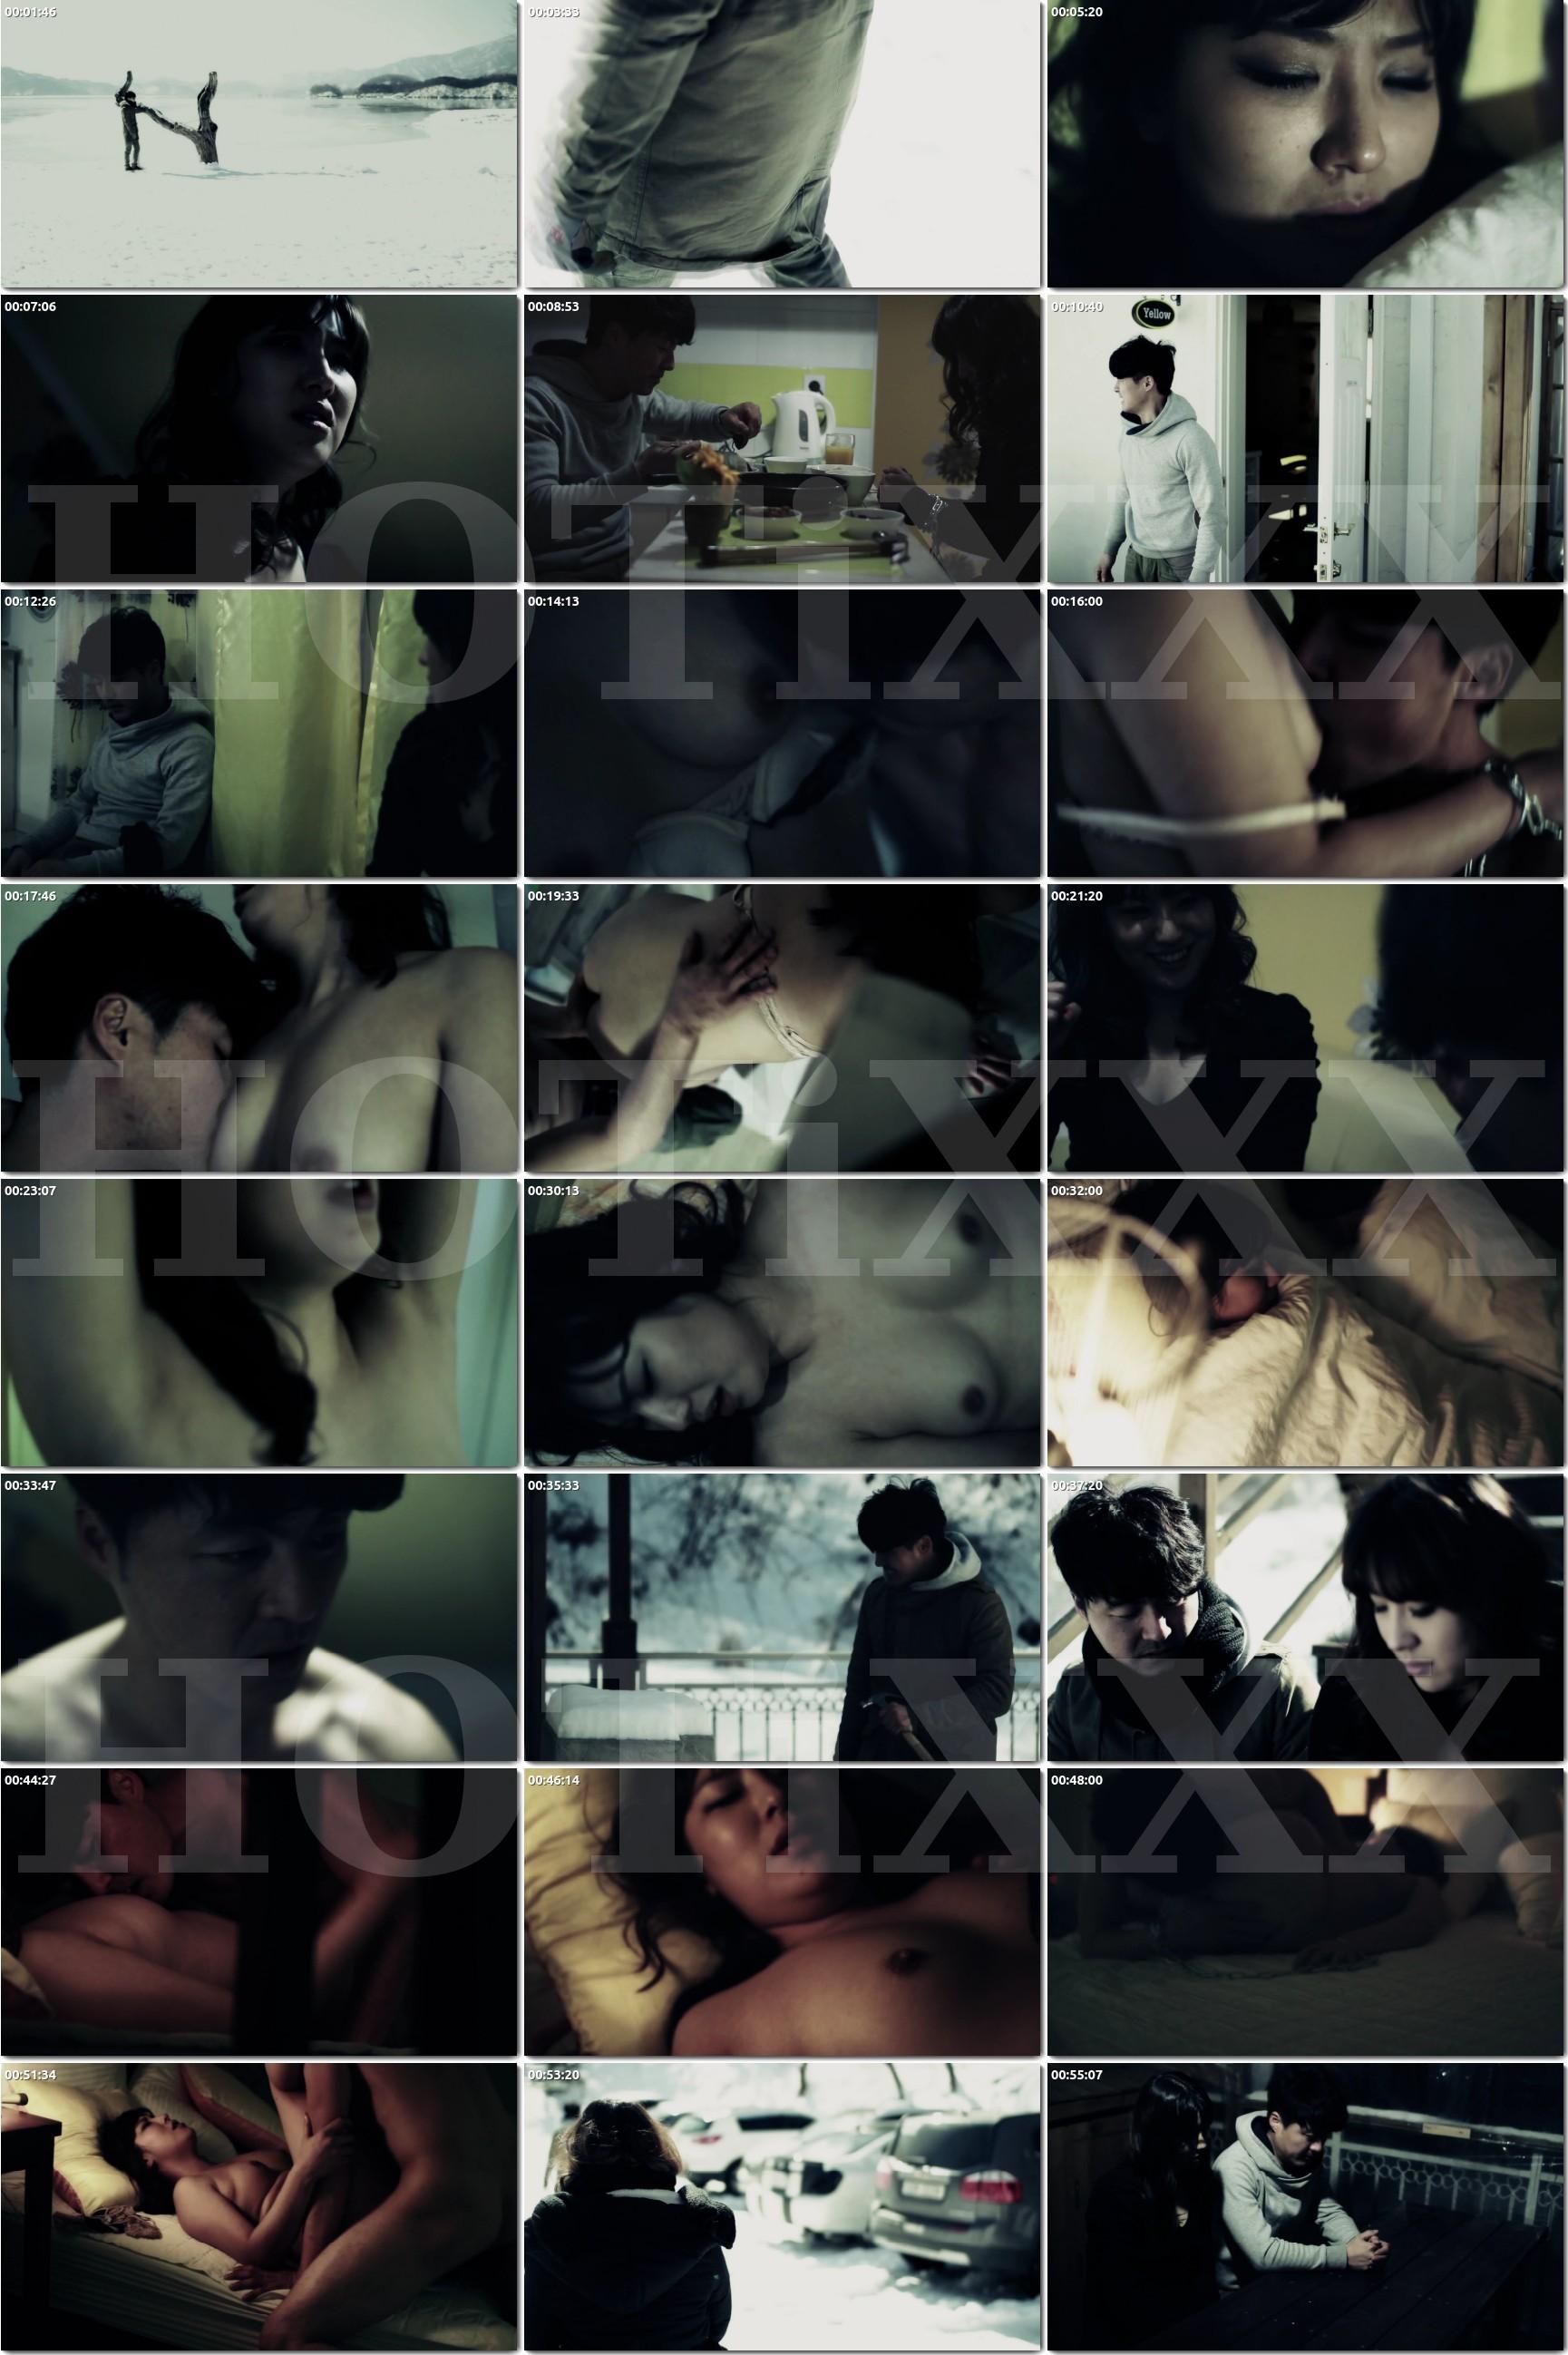 koreyskie-filmi-s-erotikoy